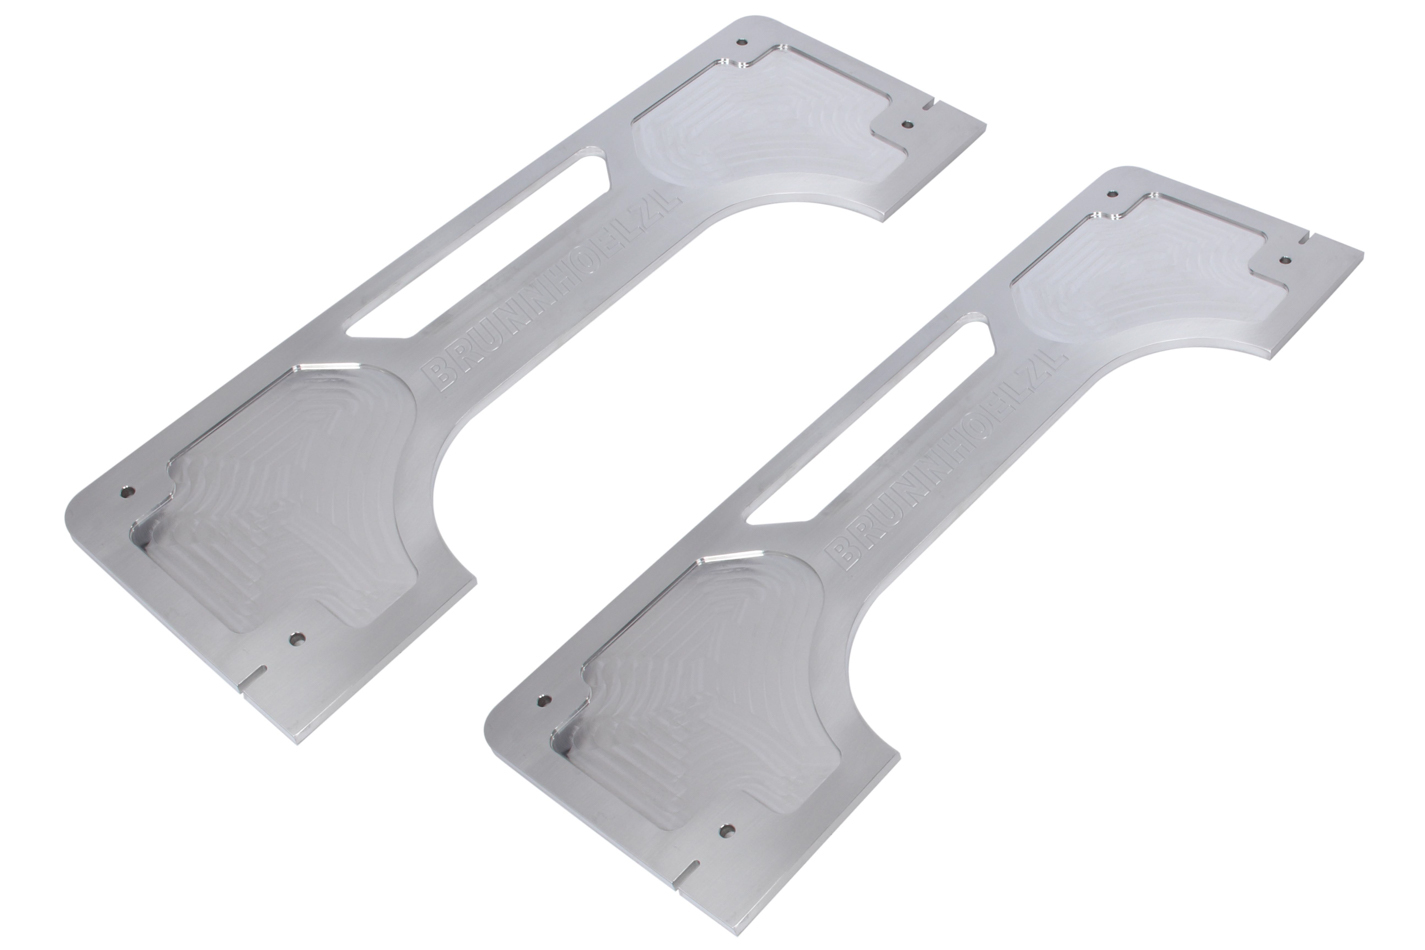 Brunnhoelzl 193 Toe-In Plates, Pro Toe Plates, Aluminum, Natural, Pair